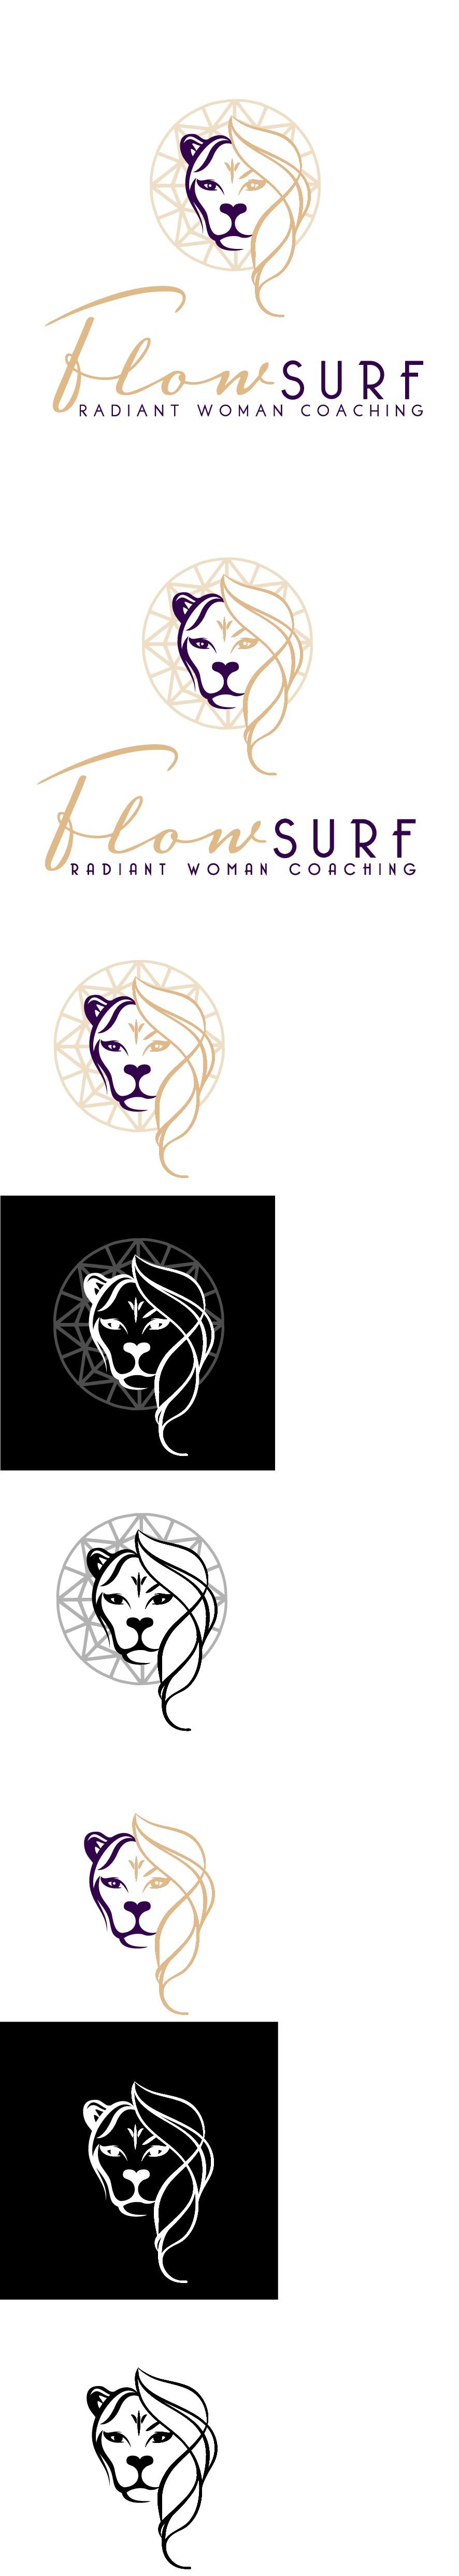 Create a stylish and impactful logo for FlowSurf`s Radiant Woman Coaching Program!